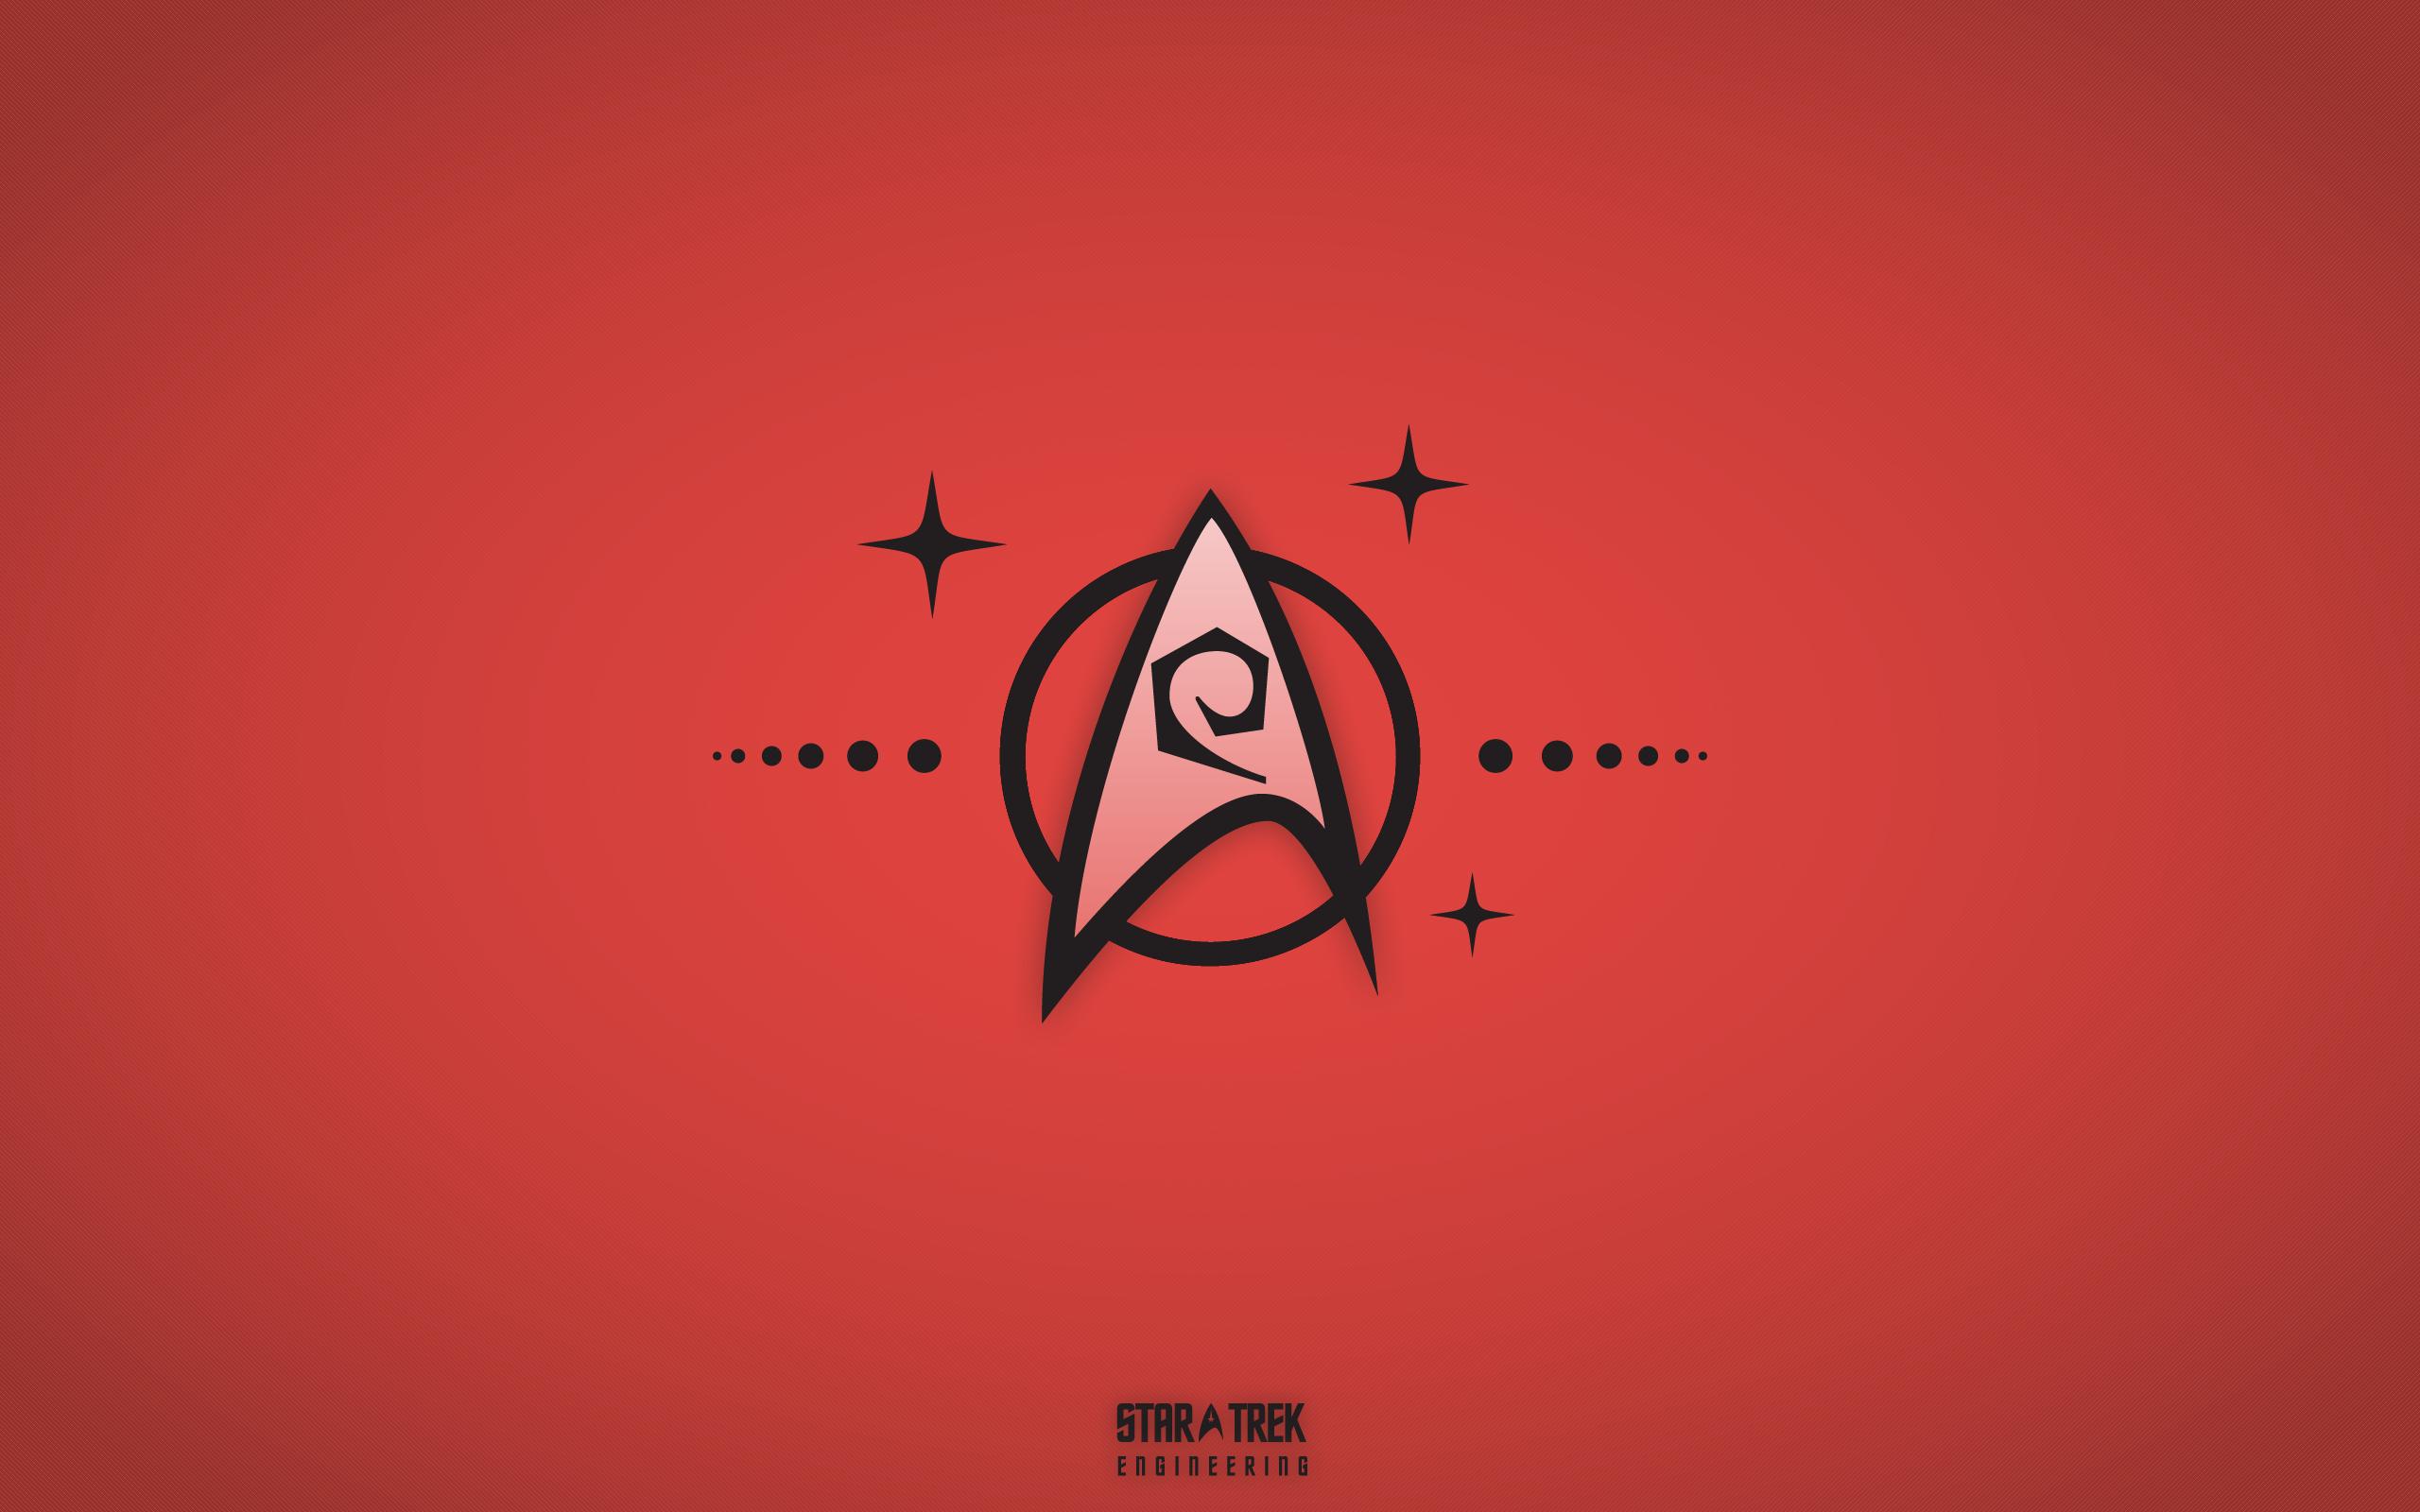 Star Trek Logo Wallpaper Posted By Ethan Walker